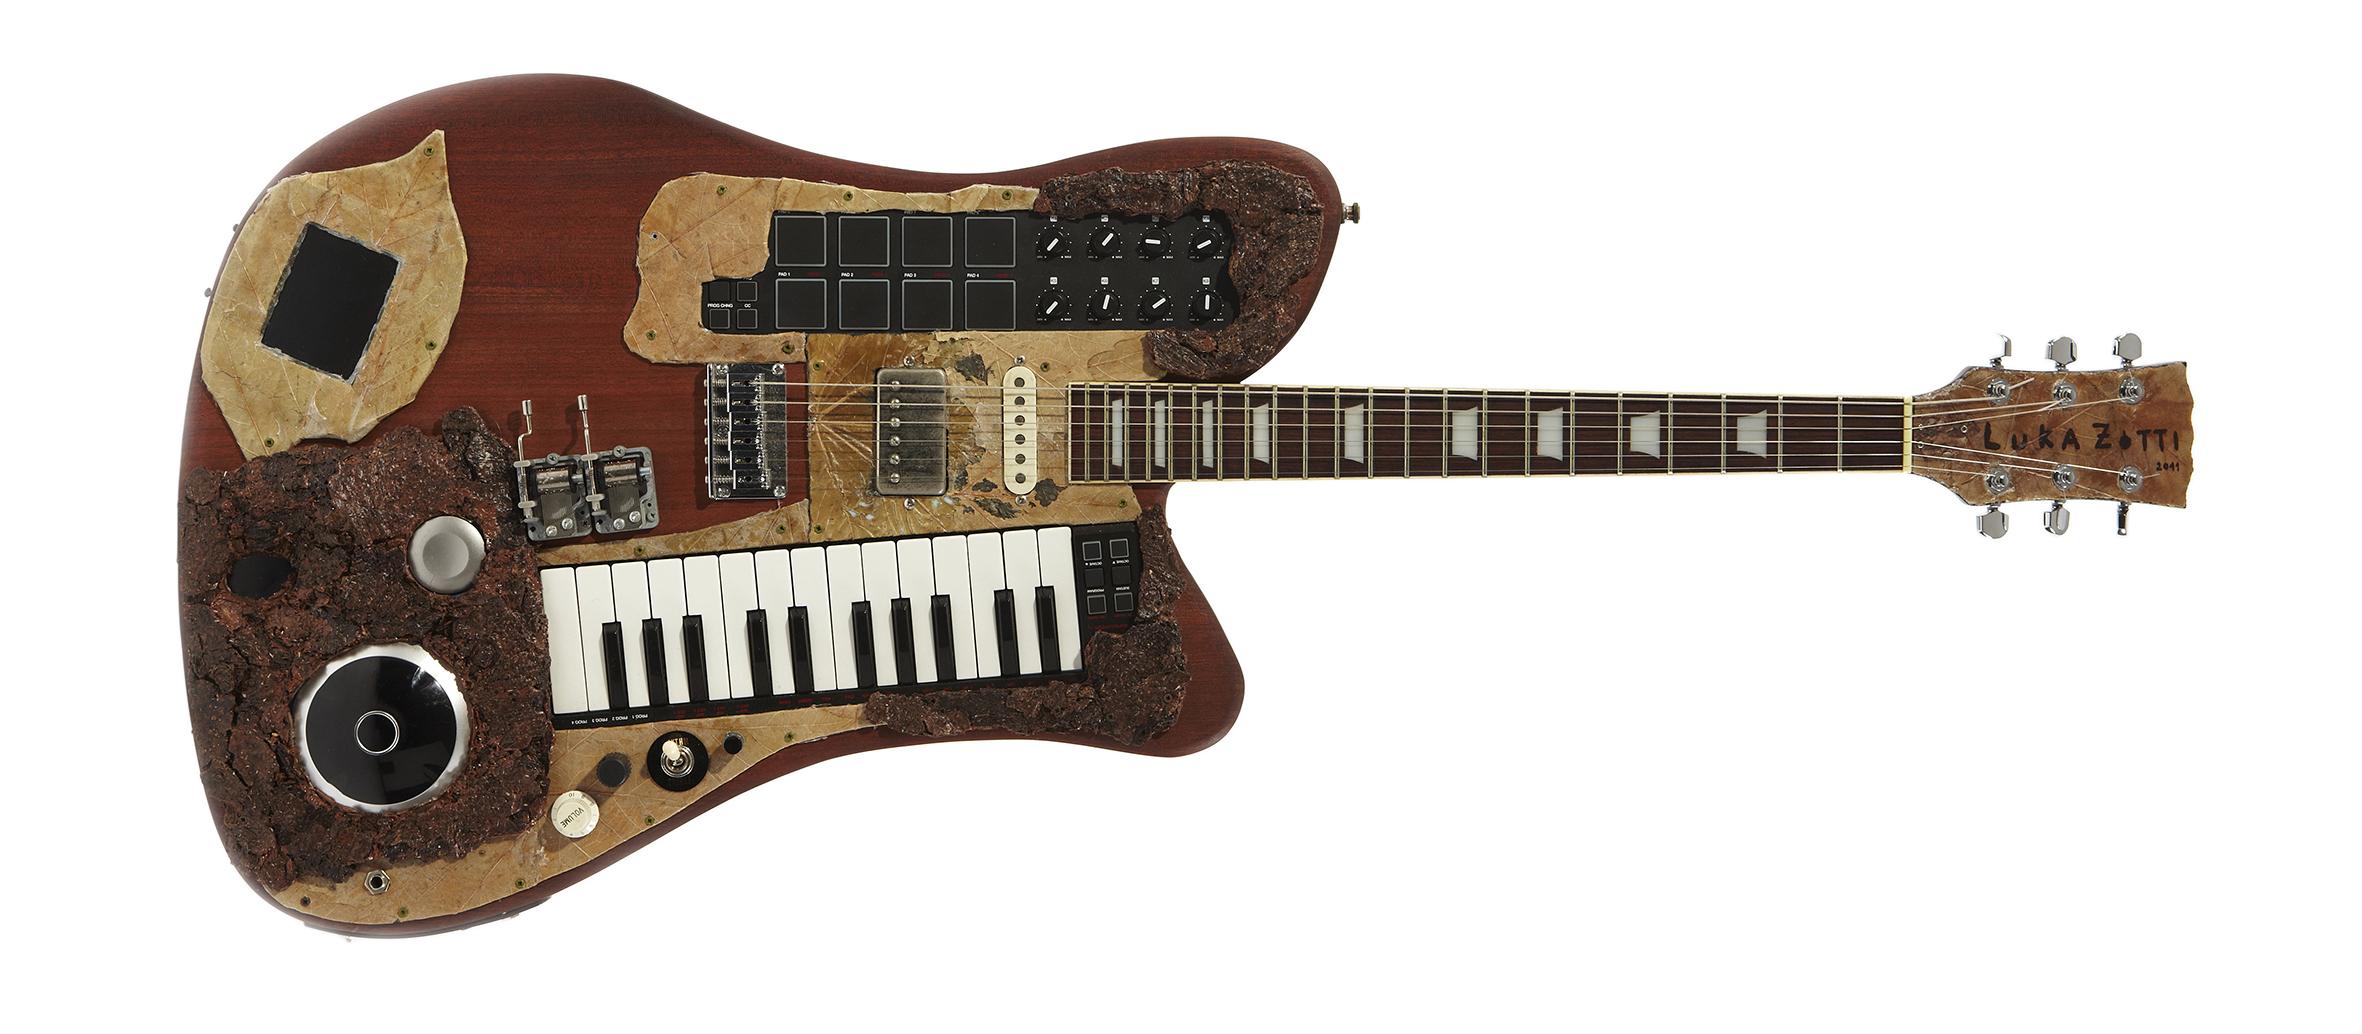 Luka Zotti - The Tree Pad Key Guitar 2